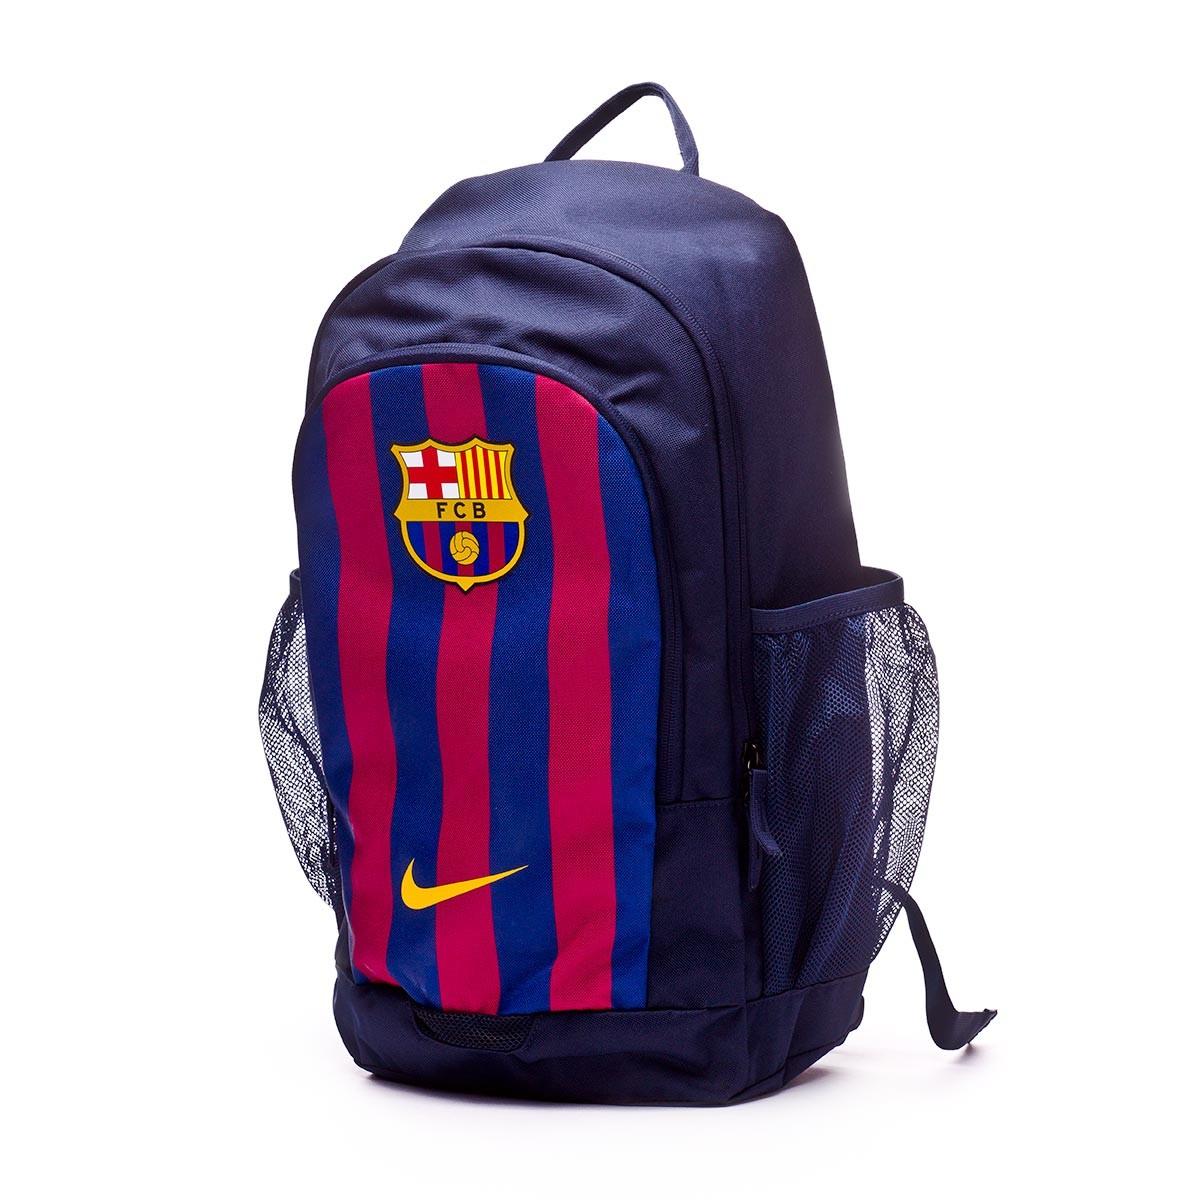 4fc702ae78e ... Mochila Stadium FC Barcelona Obsidian-Deep royal blue-University gold.  CATEGORY